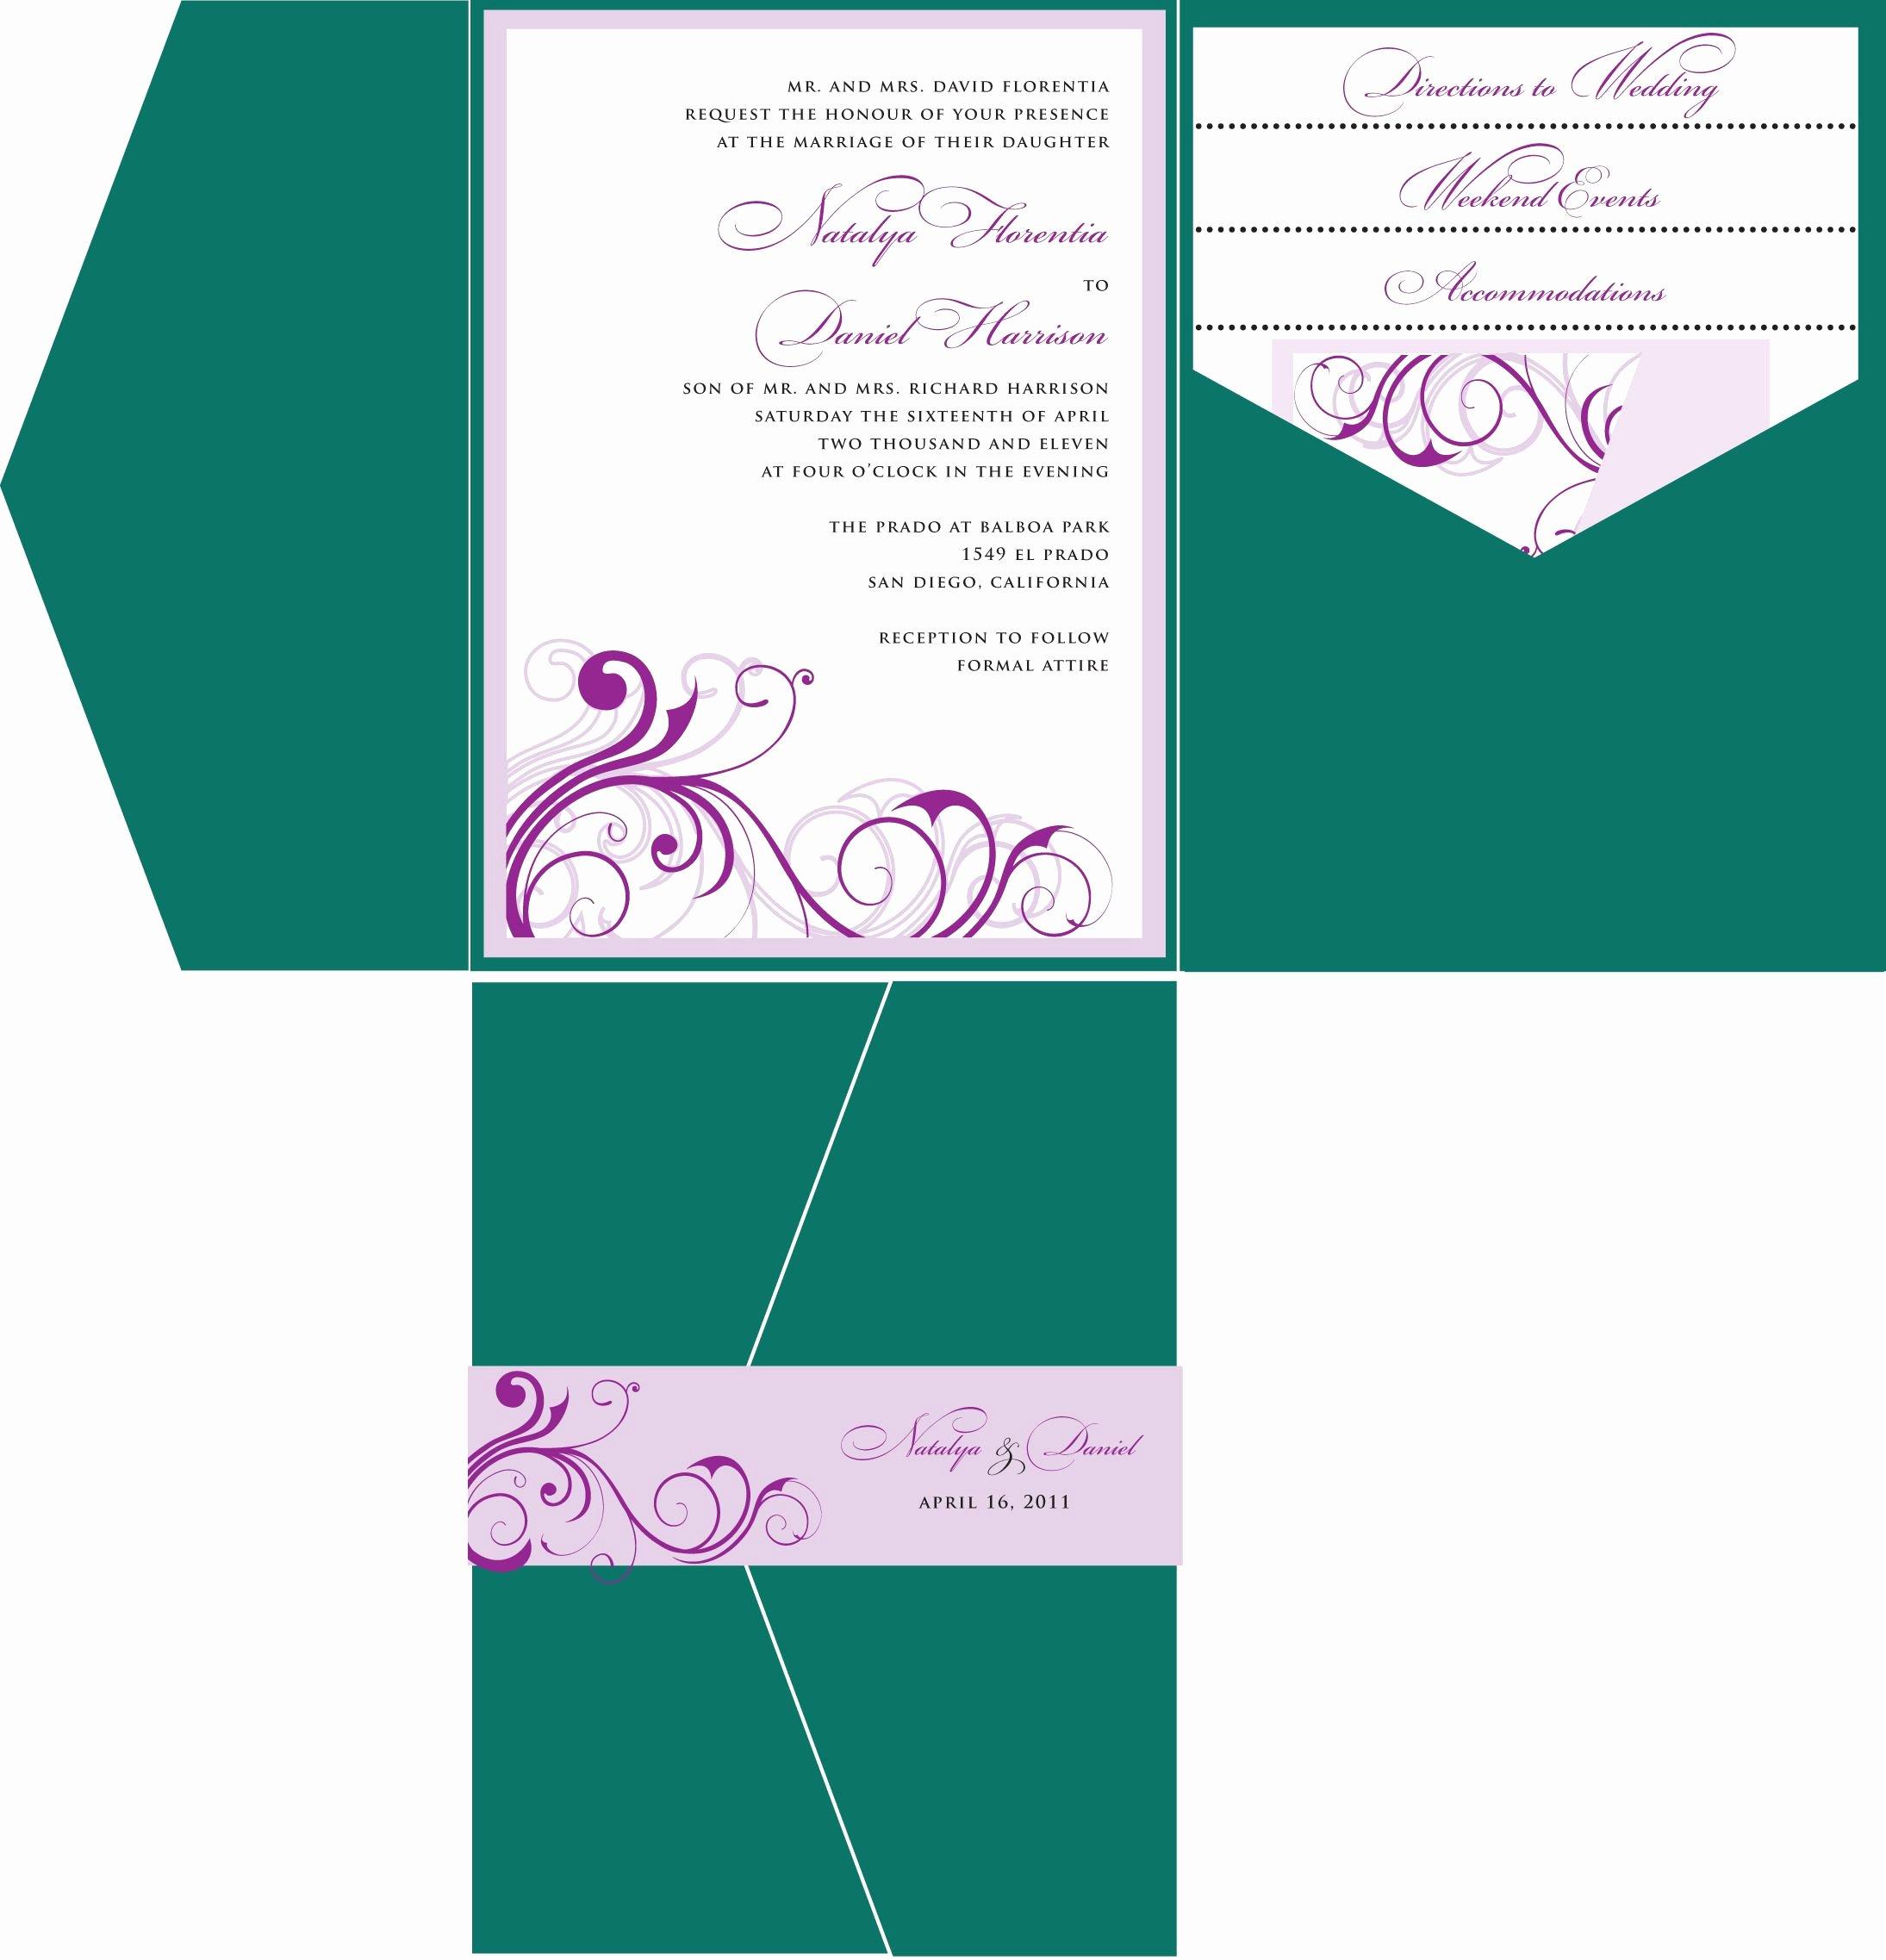 Wedding Invitation Template for Word Beautiful Wedding Invitations Template Wedding Invitations